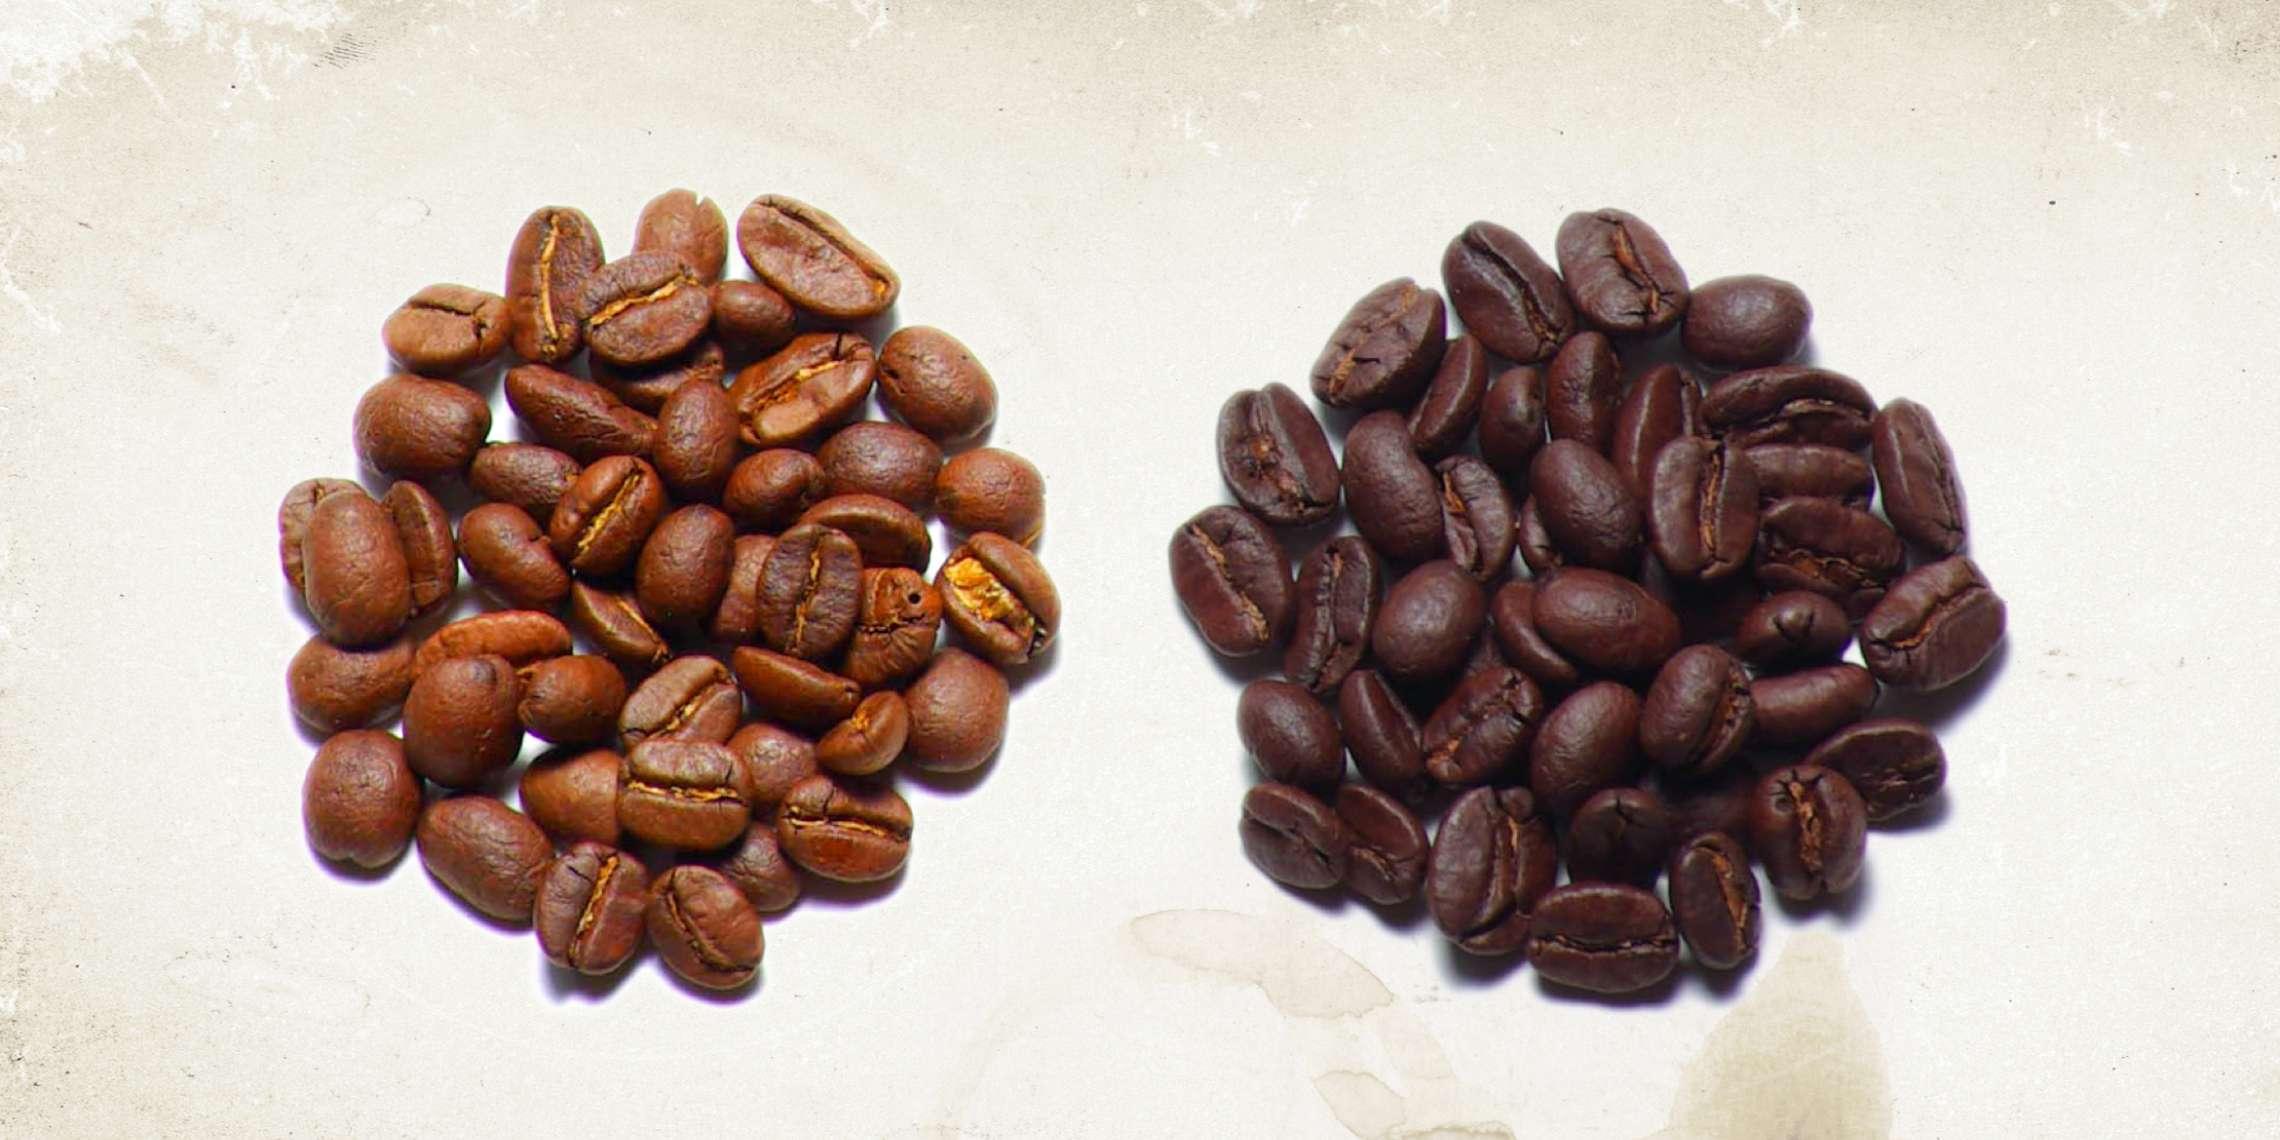 coffee beans vs espresso beans